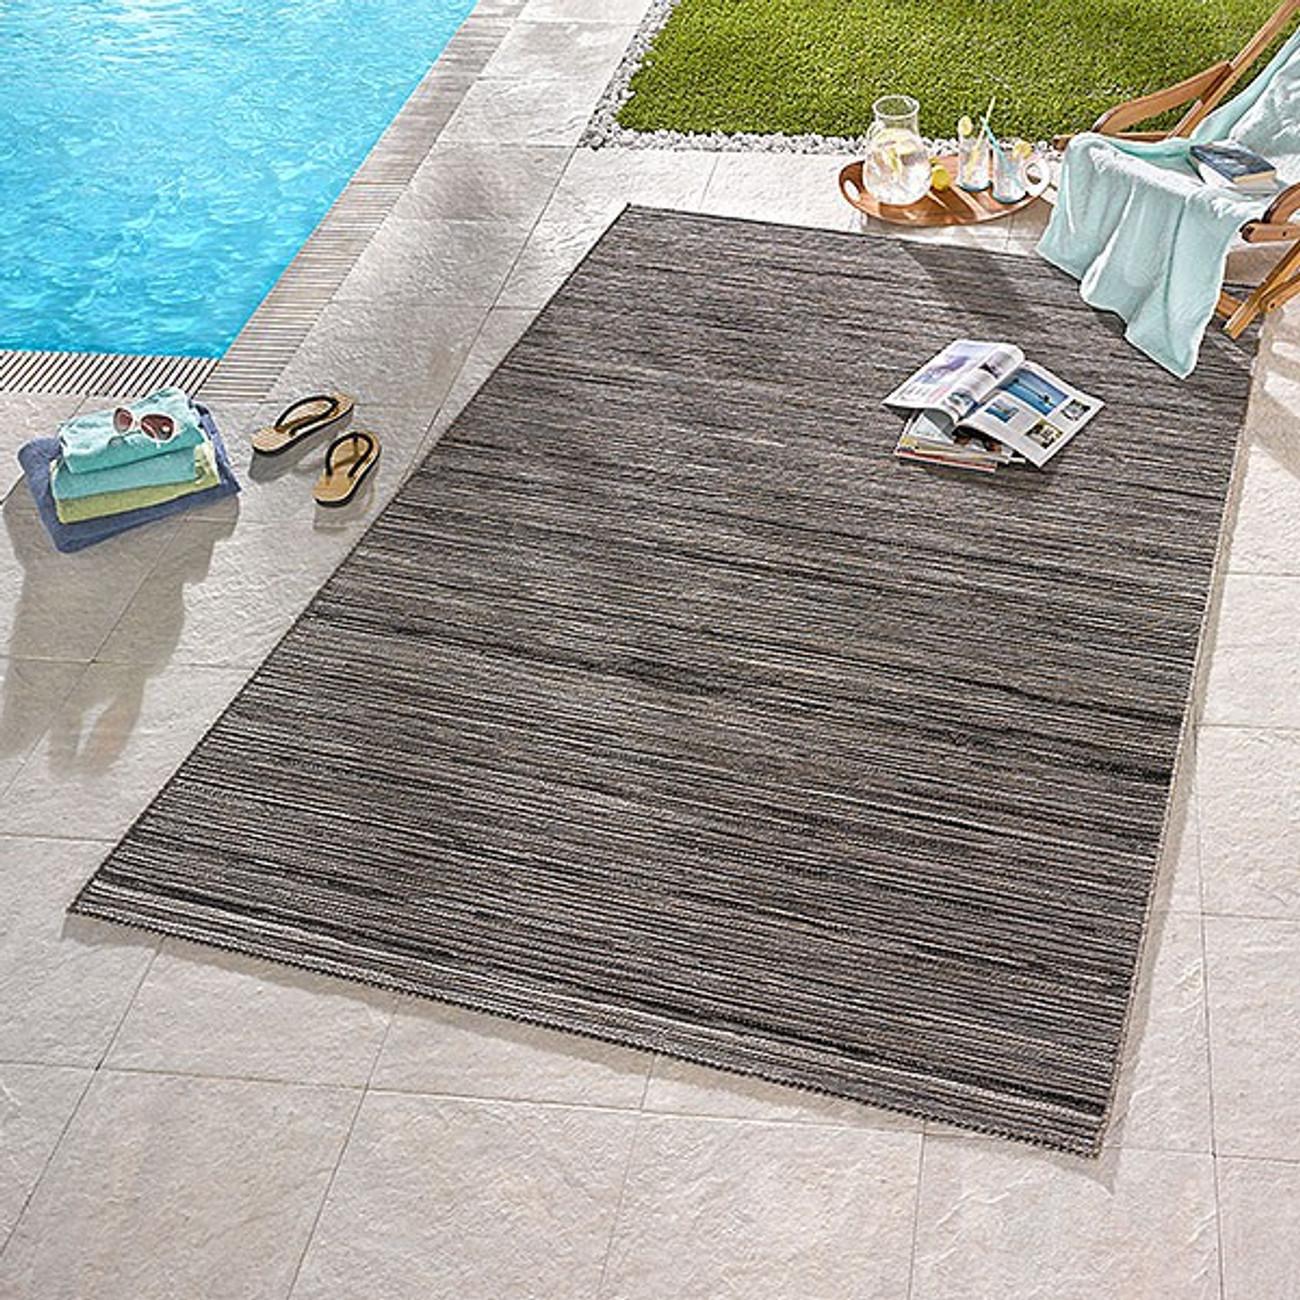 in outdoor flachgewebe teppich lotus grau melliert ebay. Black Bedroom Furniture Sets. Home Design Ideas